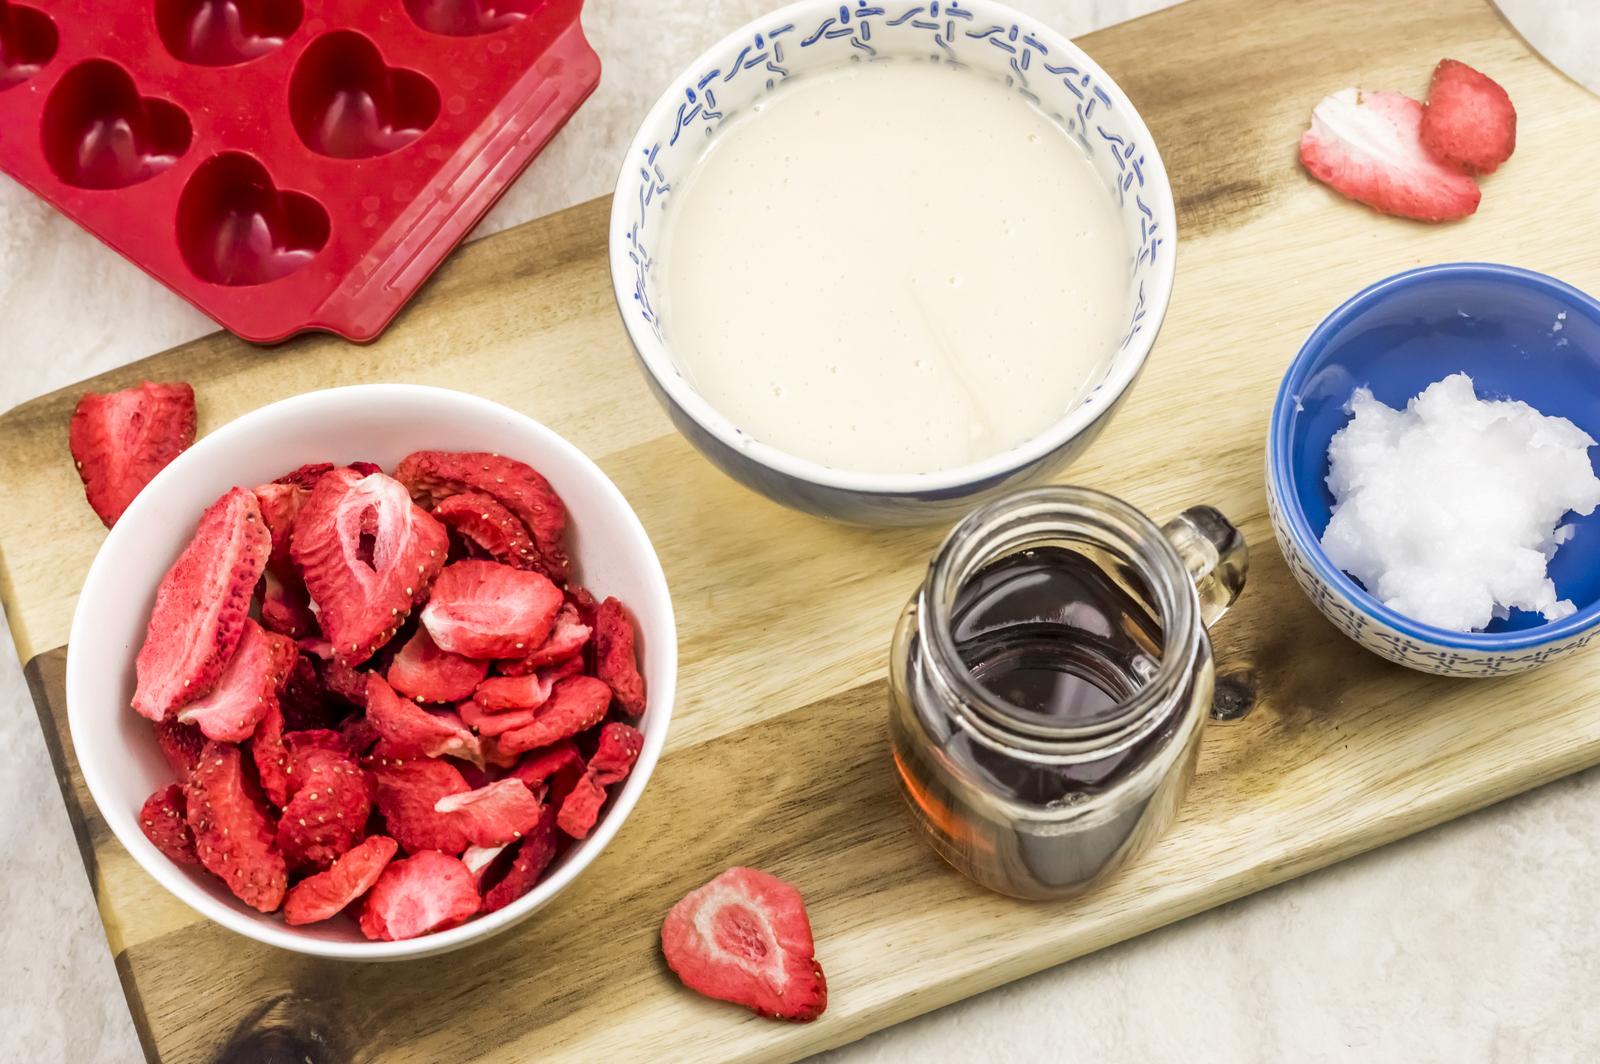 paleo fudge ingredients